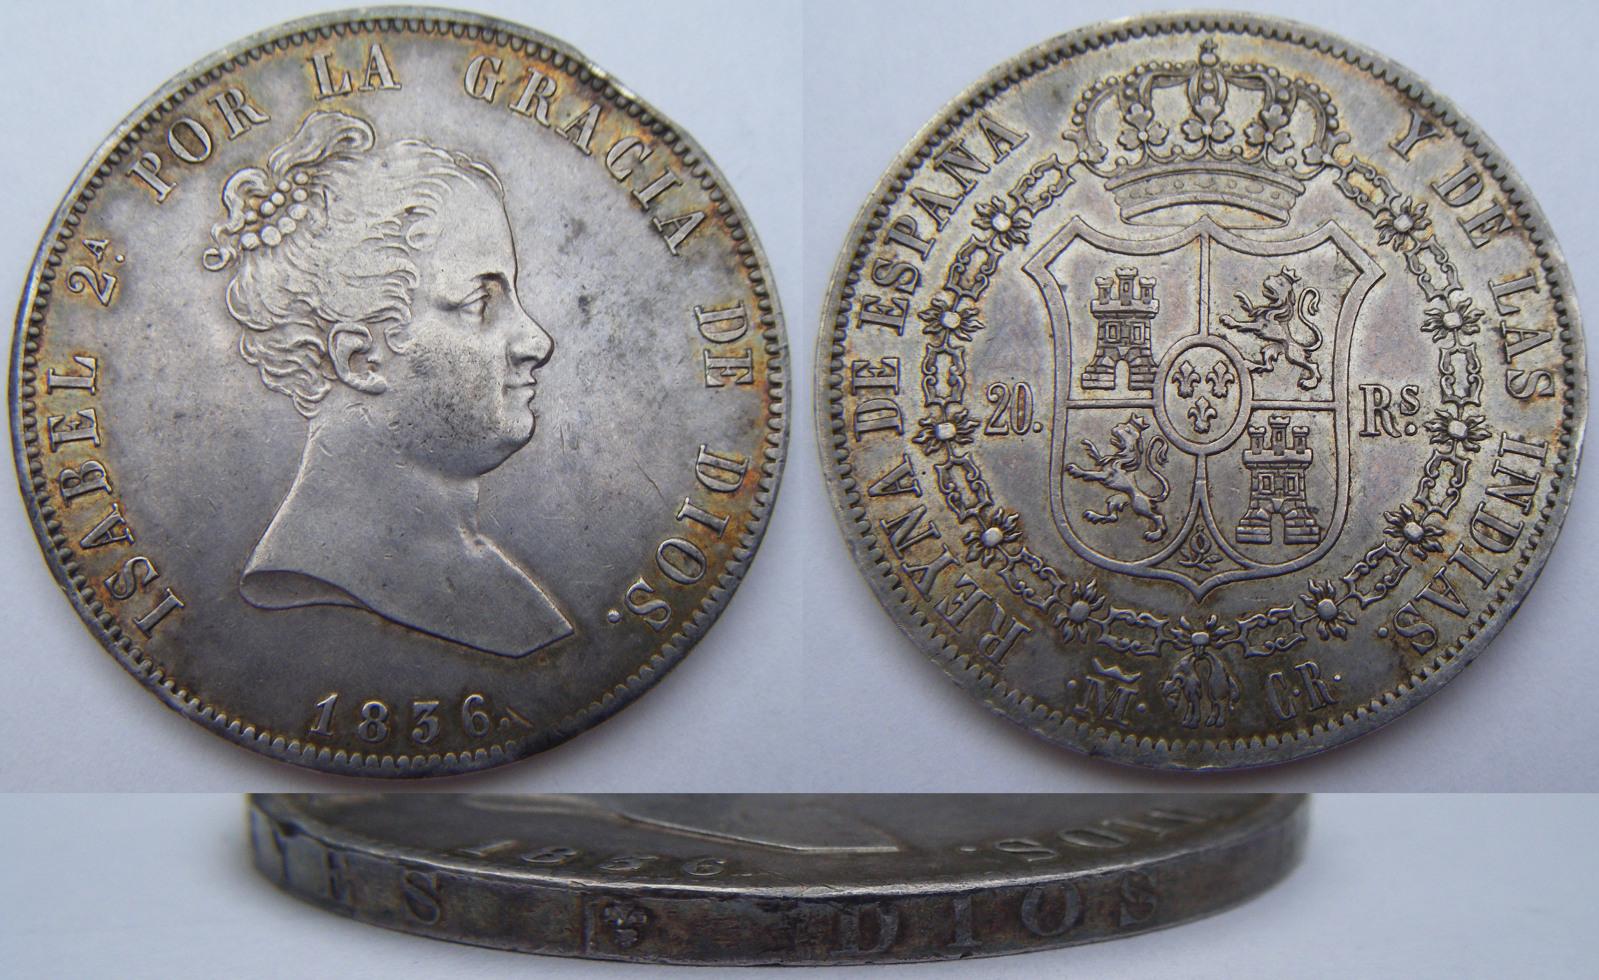 20 REALES ISABEL II 1836 MADRID CR 28vzgi